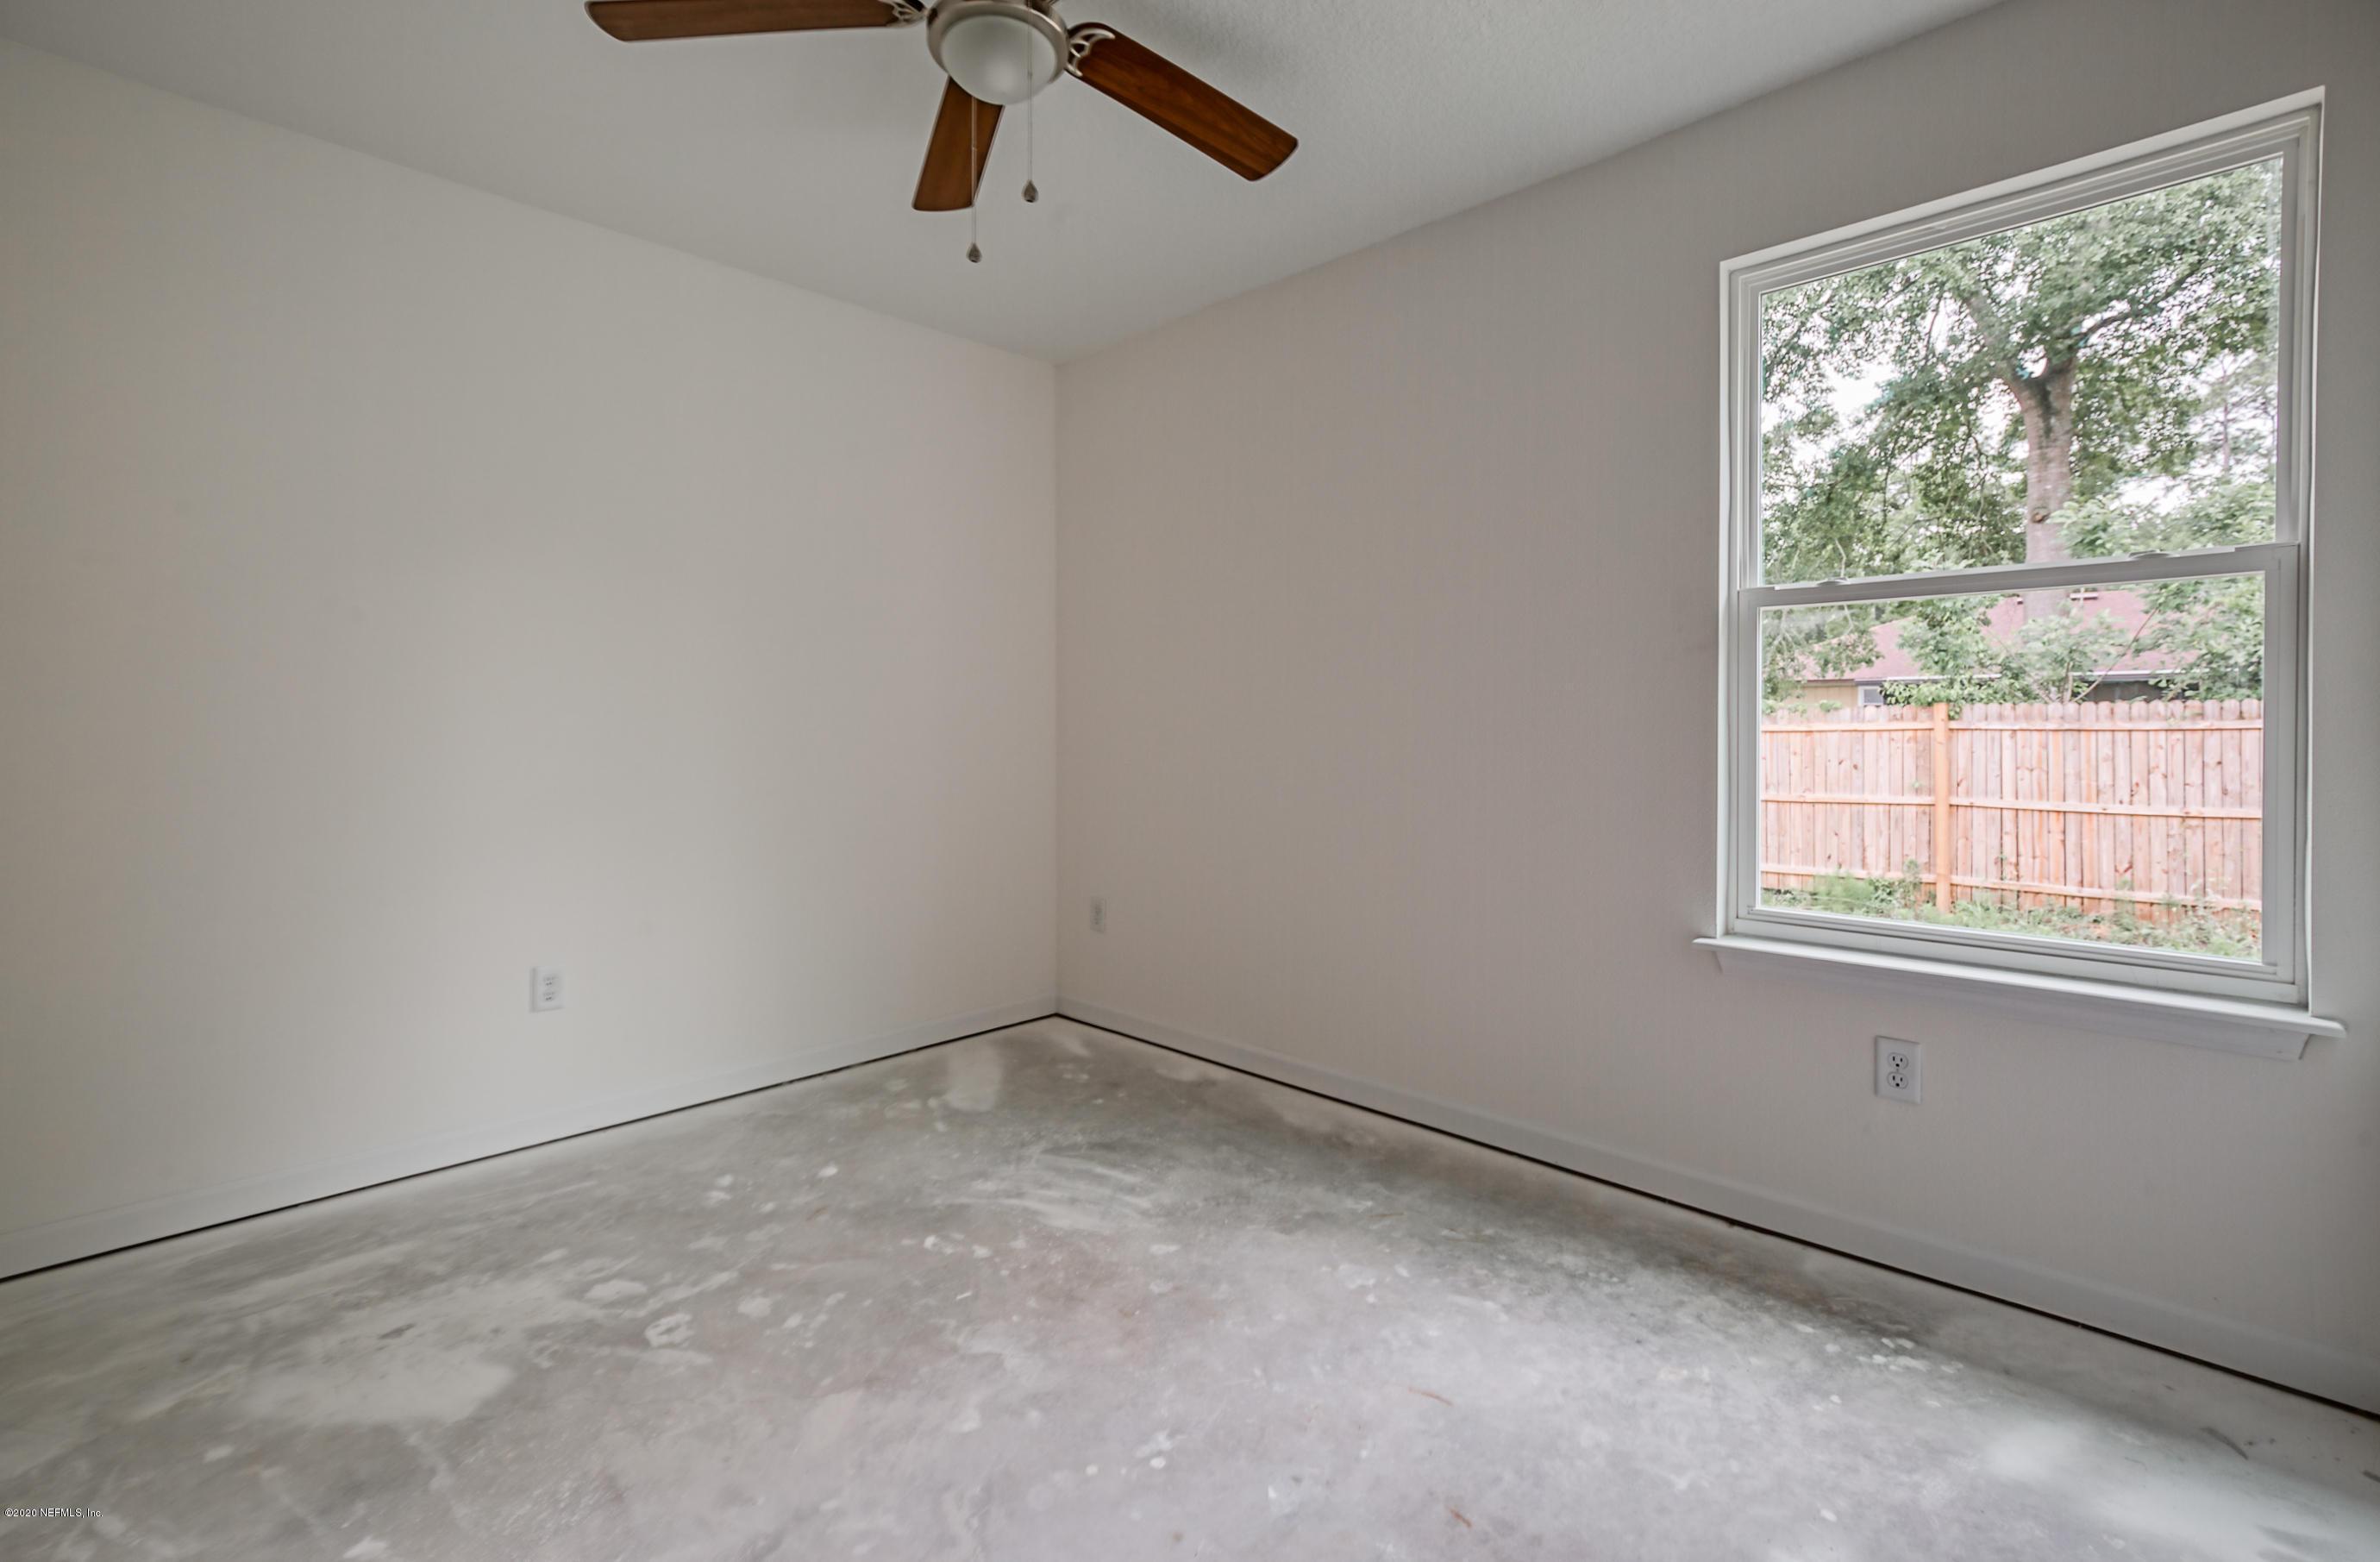 6081 PATRIOTS LANDING, JACKSONVILLE, FLORIDA 32244, 4 Bedrooms Bedrooms, ,2 BathroomsBathrooms,Residential,For sale,PATRIOTS LANDING,1080445